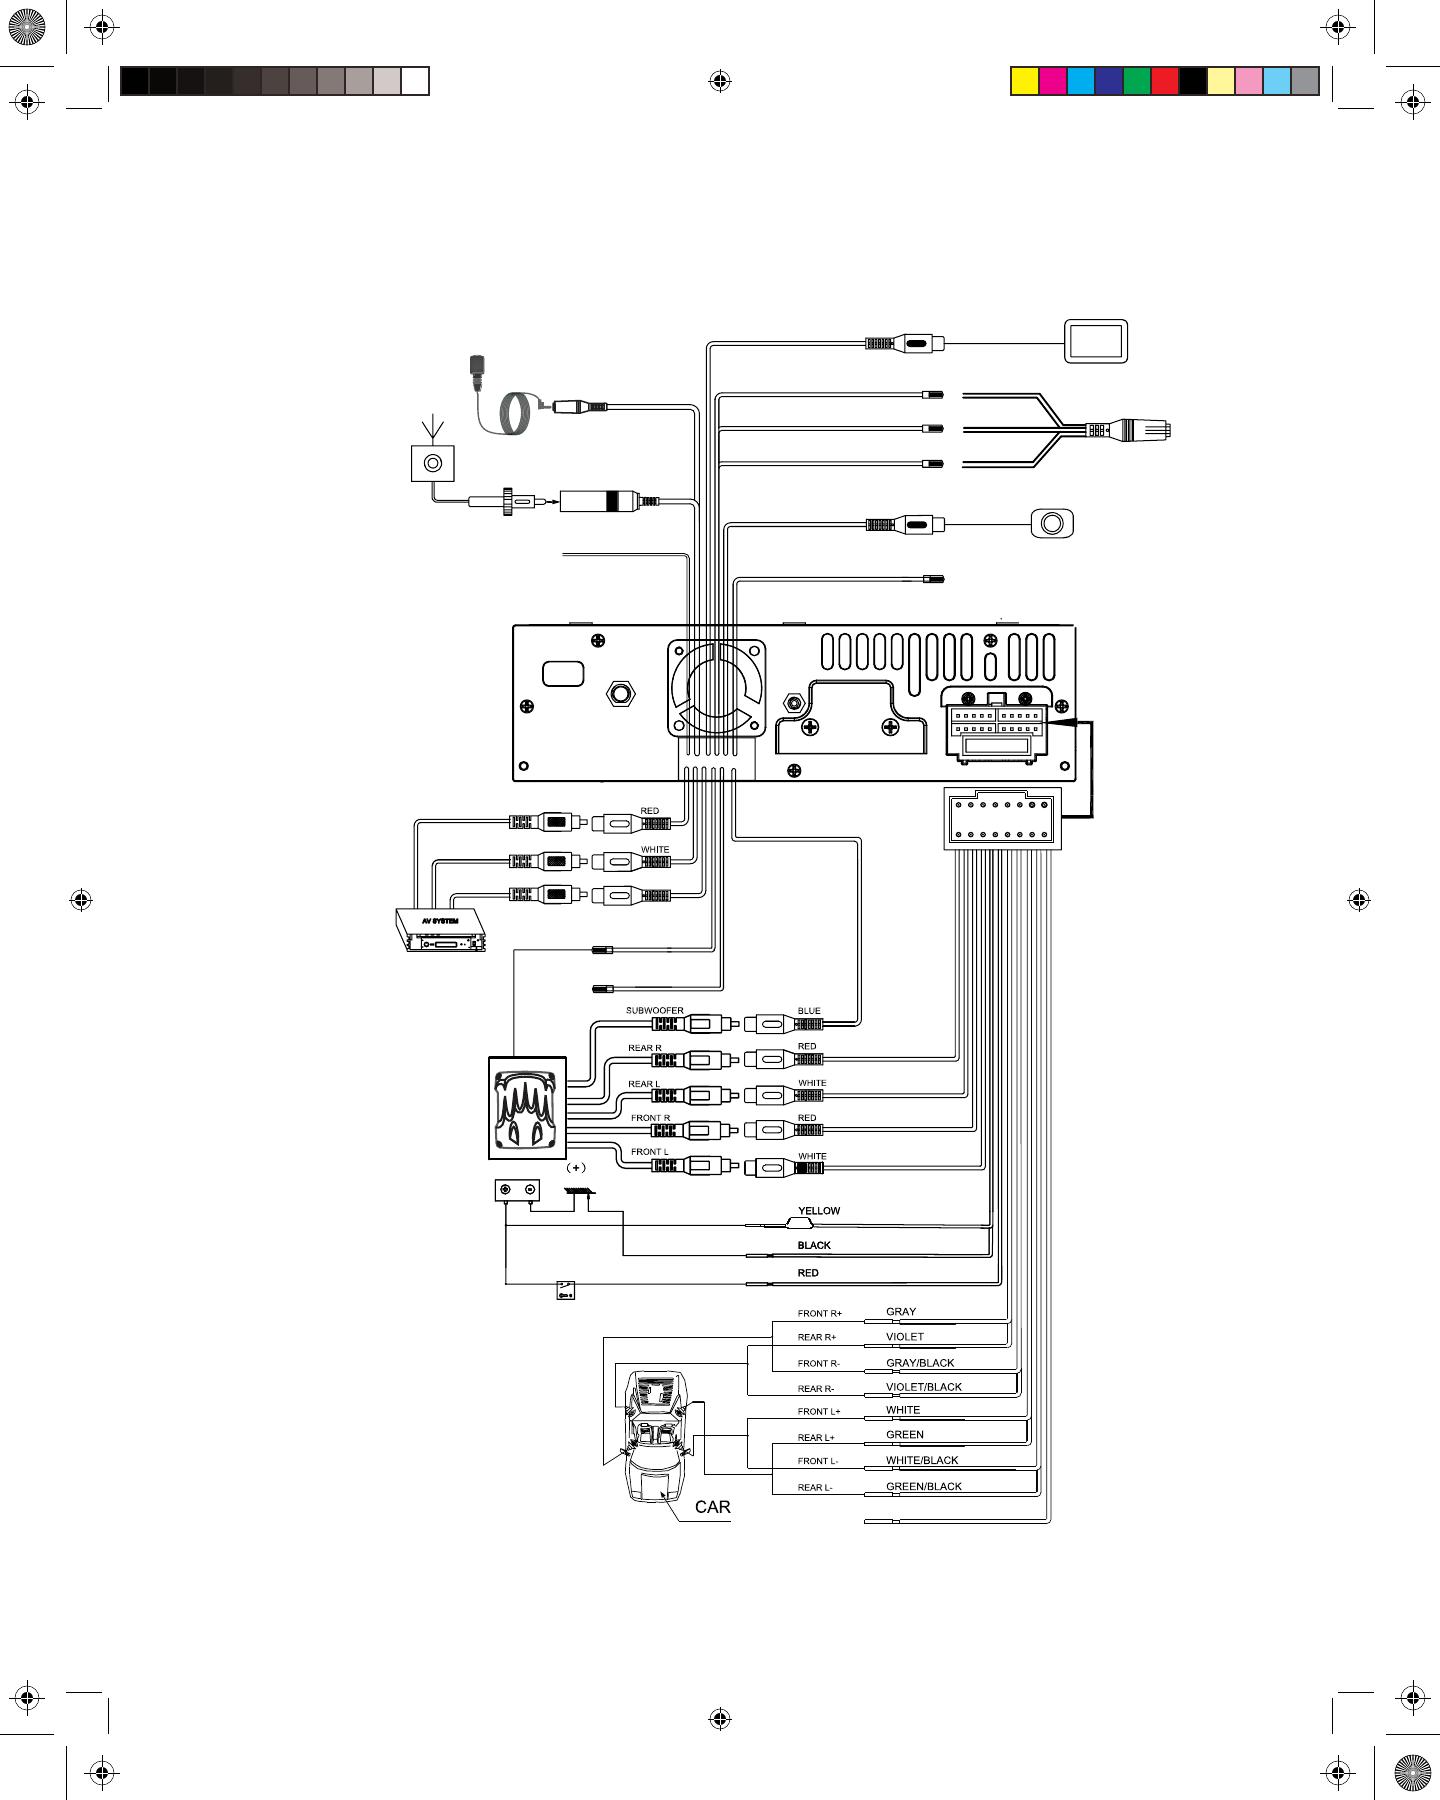 Jensen VX3010 IM_v1.revised VX 3012 Installation Quick Start Guide VX3012  IM ENUserManual.wiki